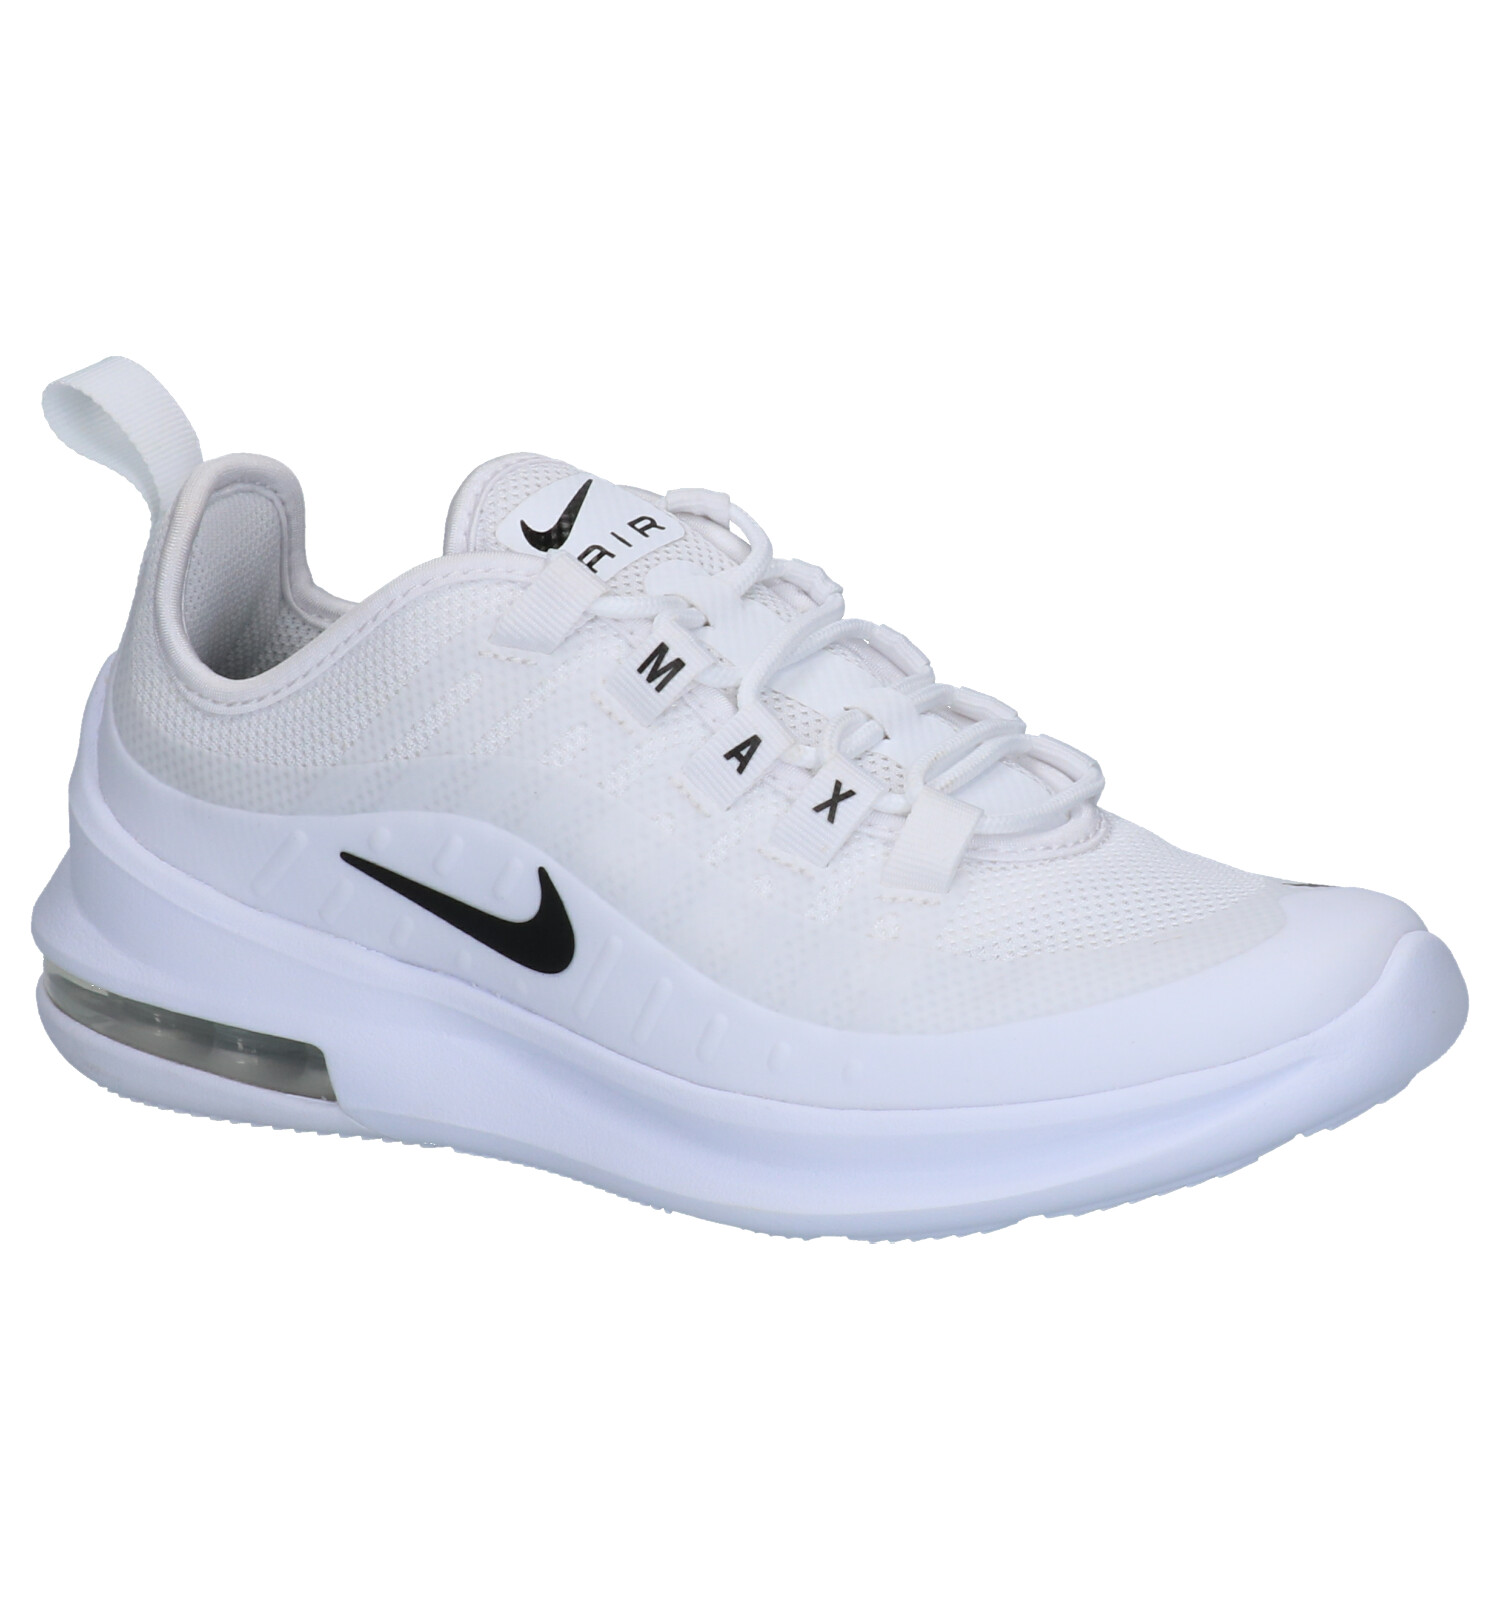 WitBruine Sneakers Nike Air Max Axis   TORFS.BE   Gratis